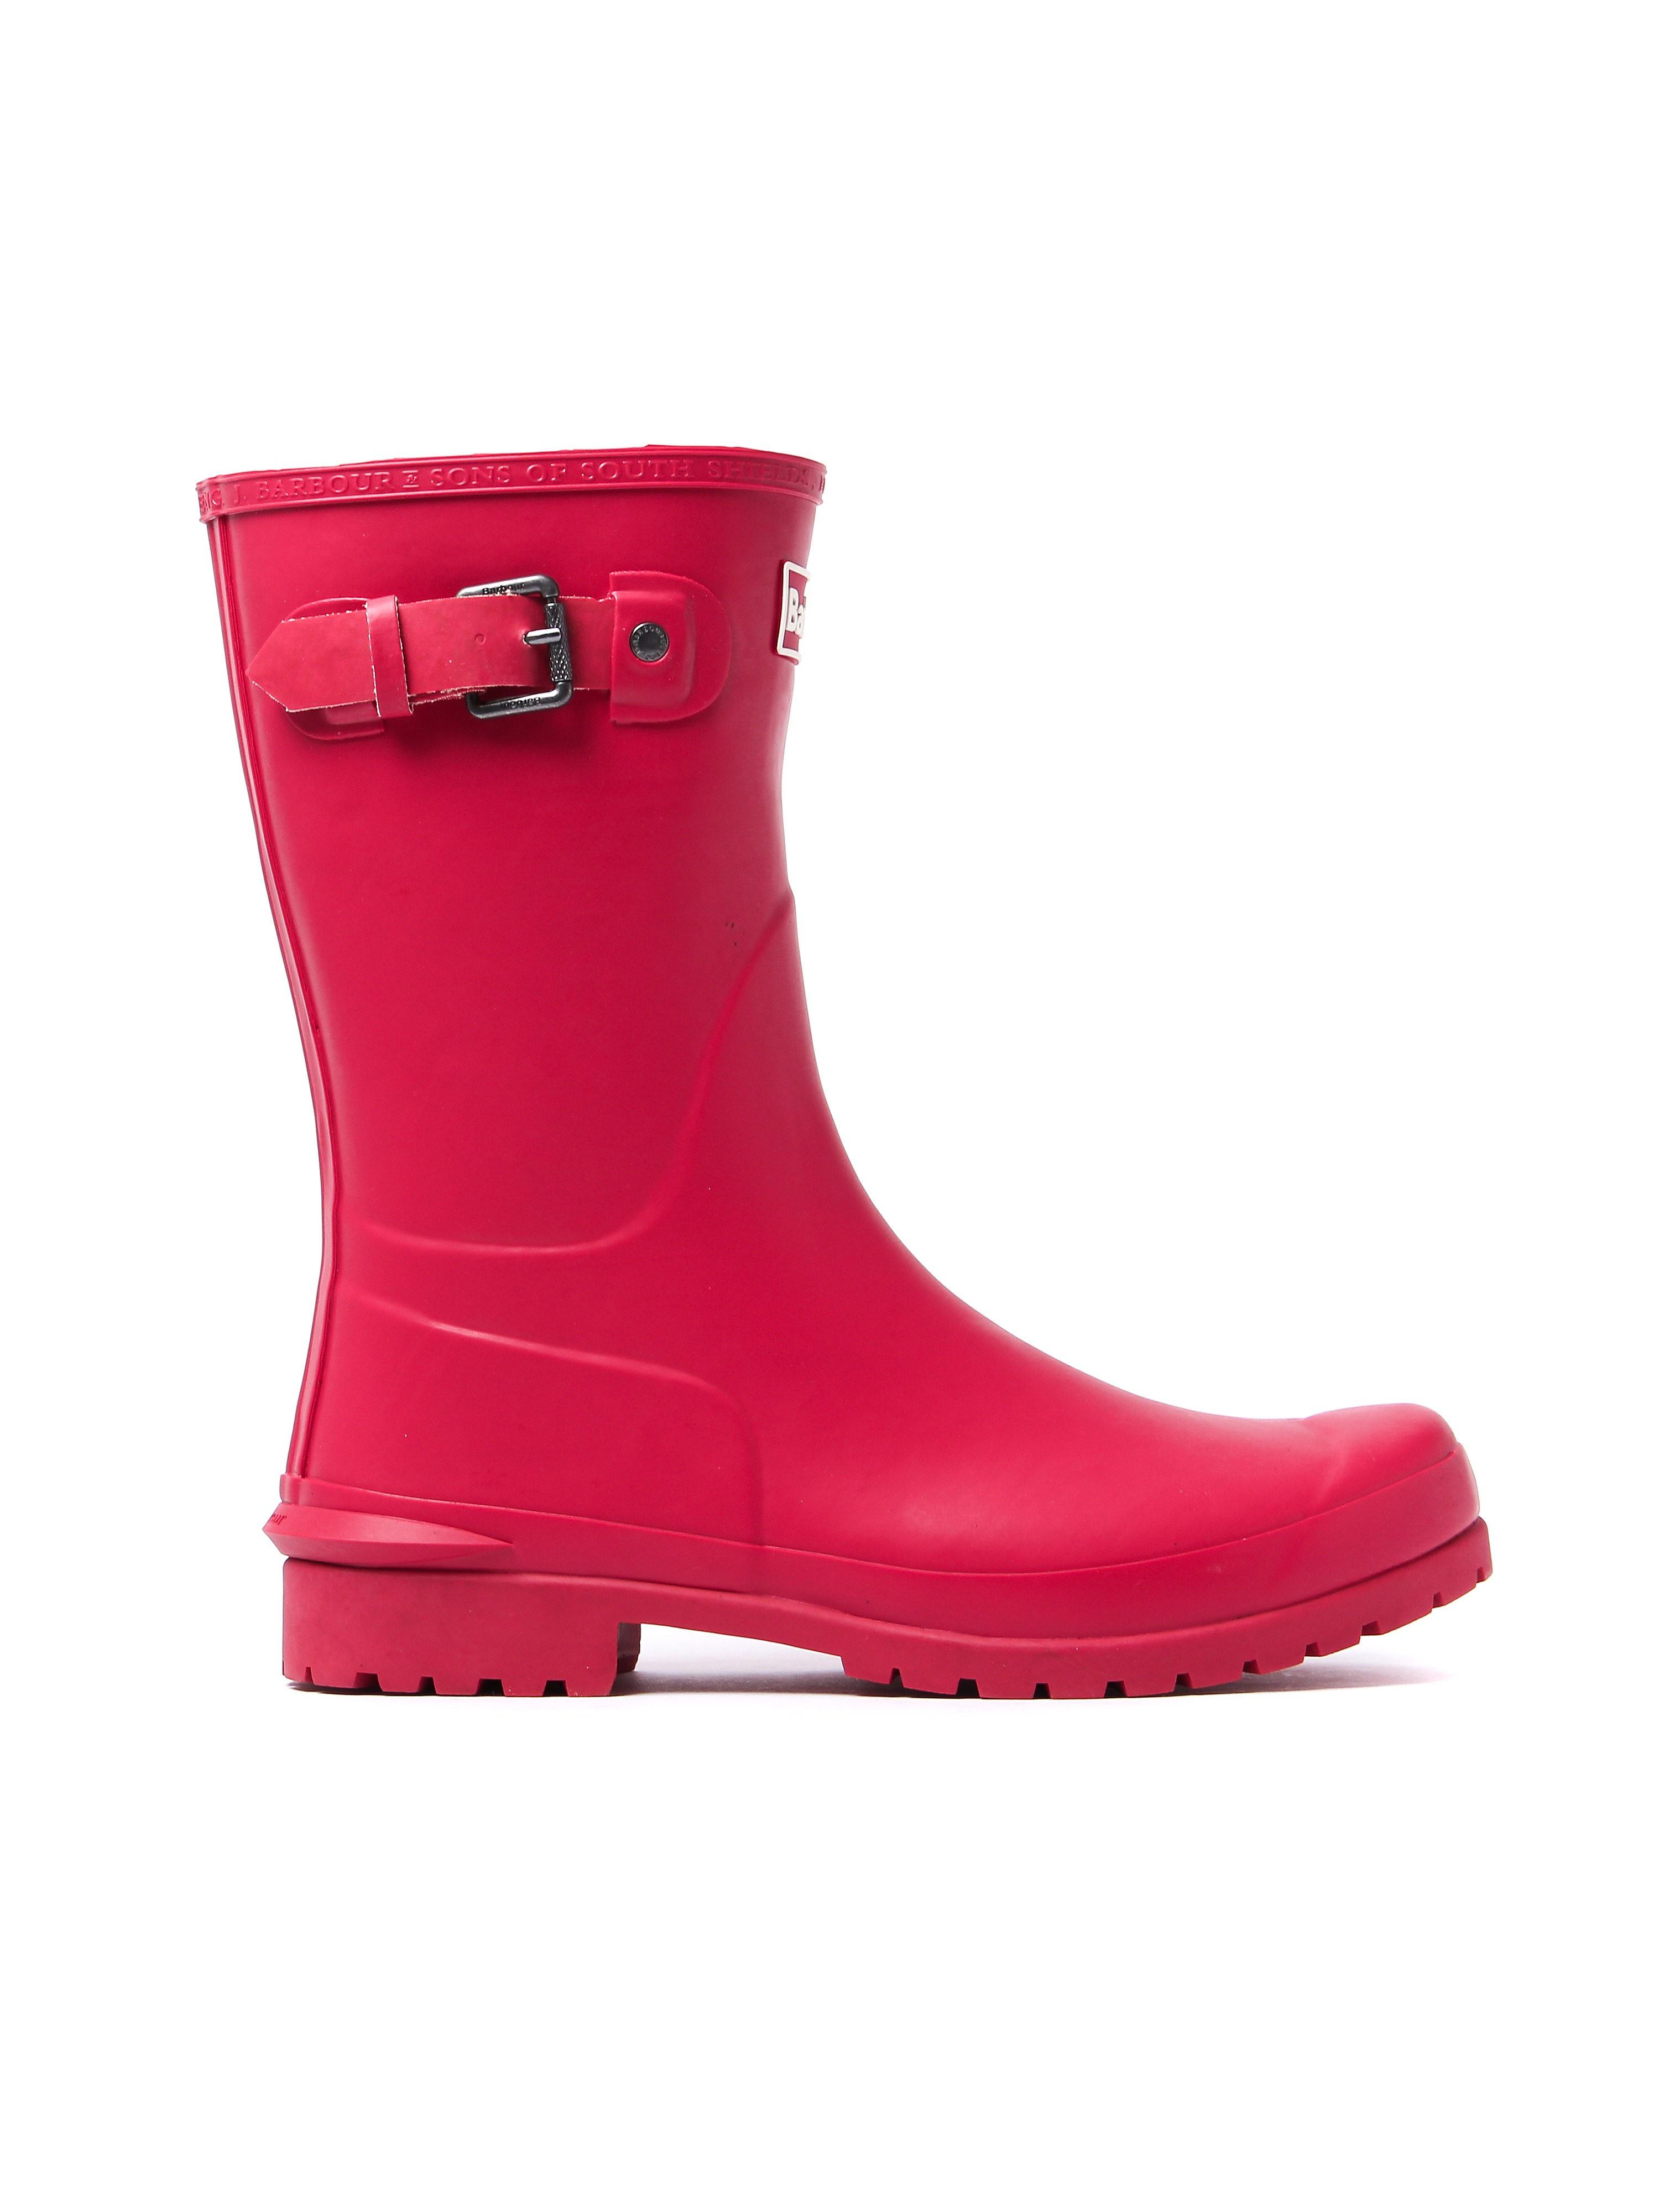 Barbour Women's Primrose Short Wellington Boots - Raspberry